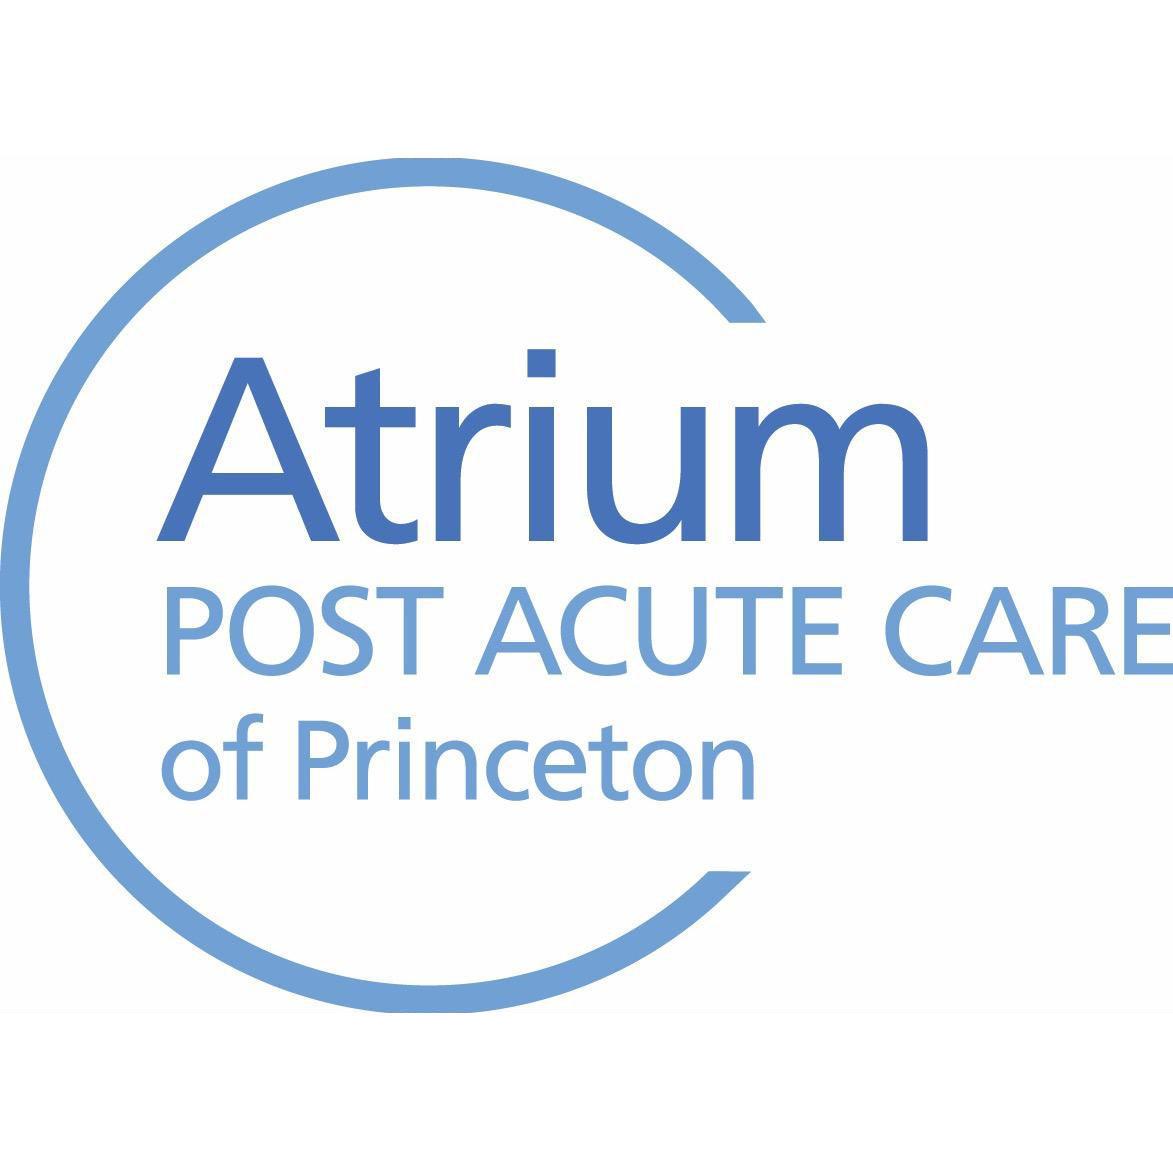 Atrium Post Acute Care of Princeton